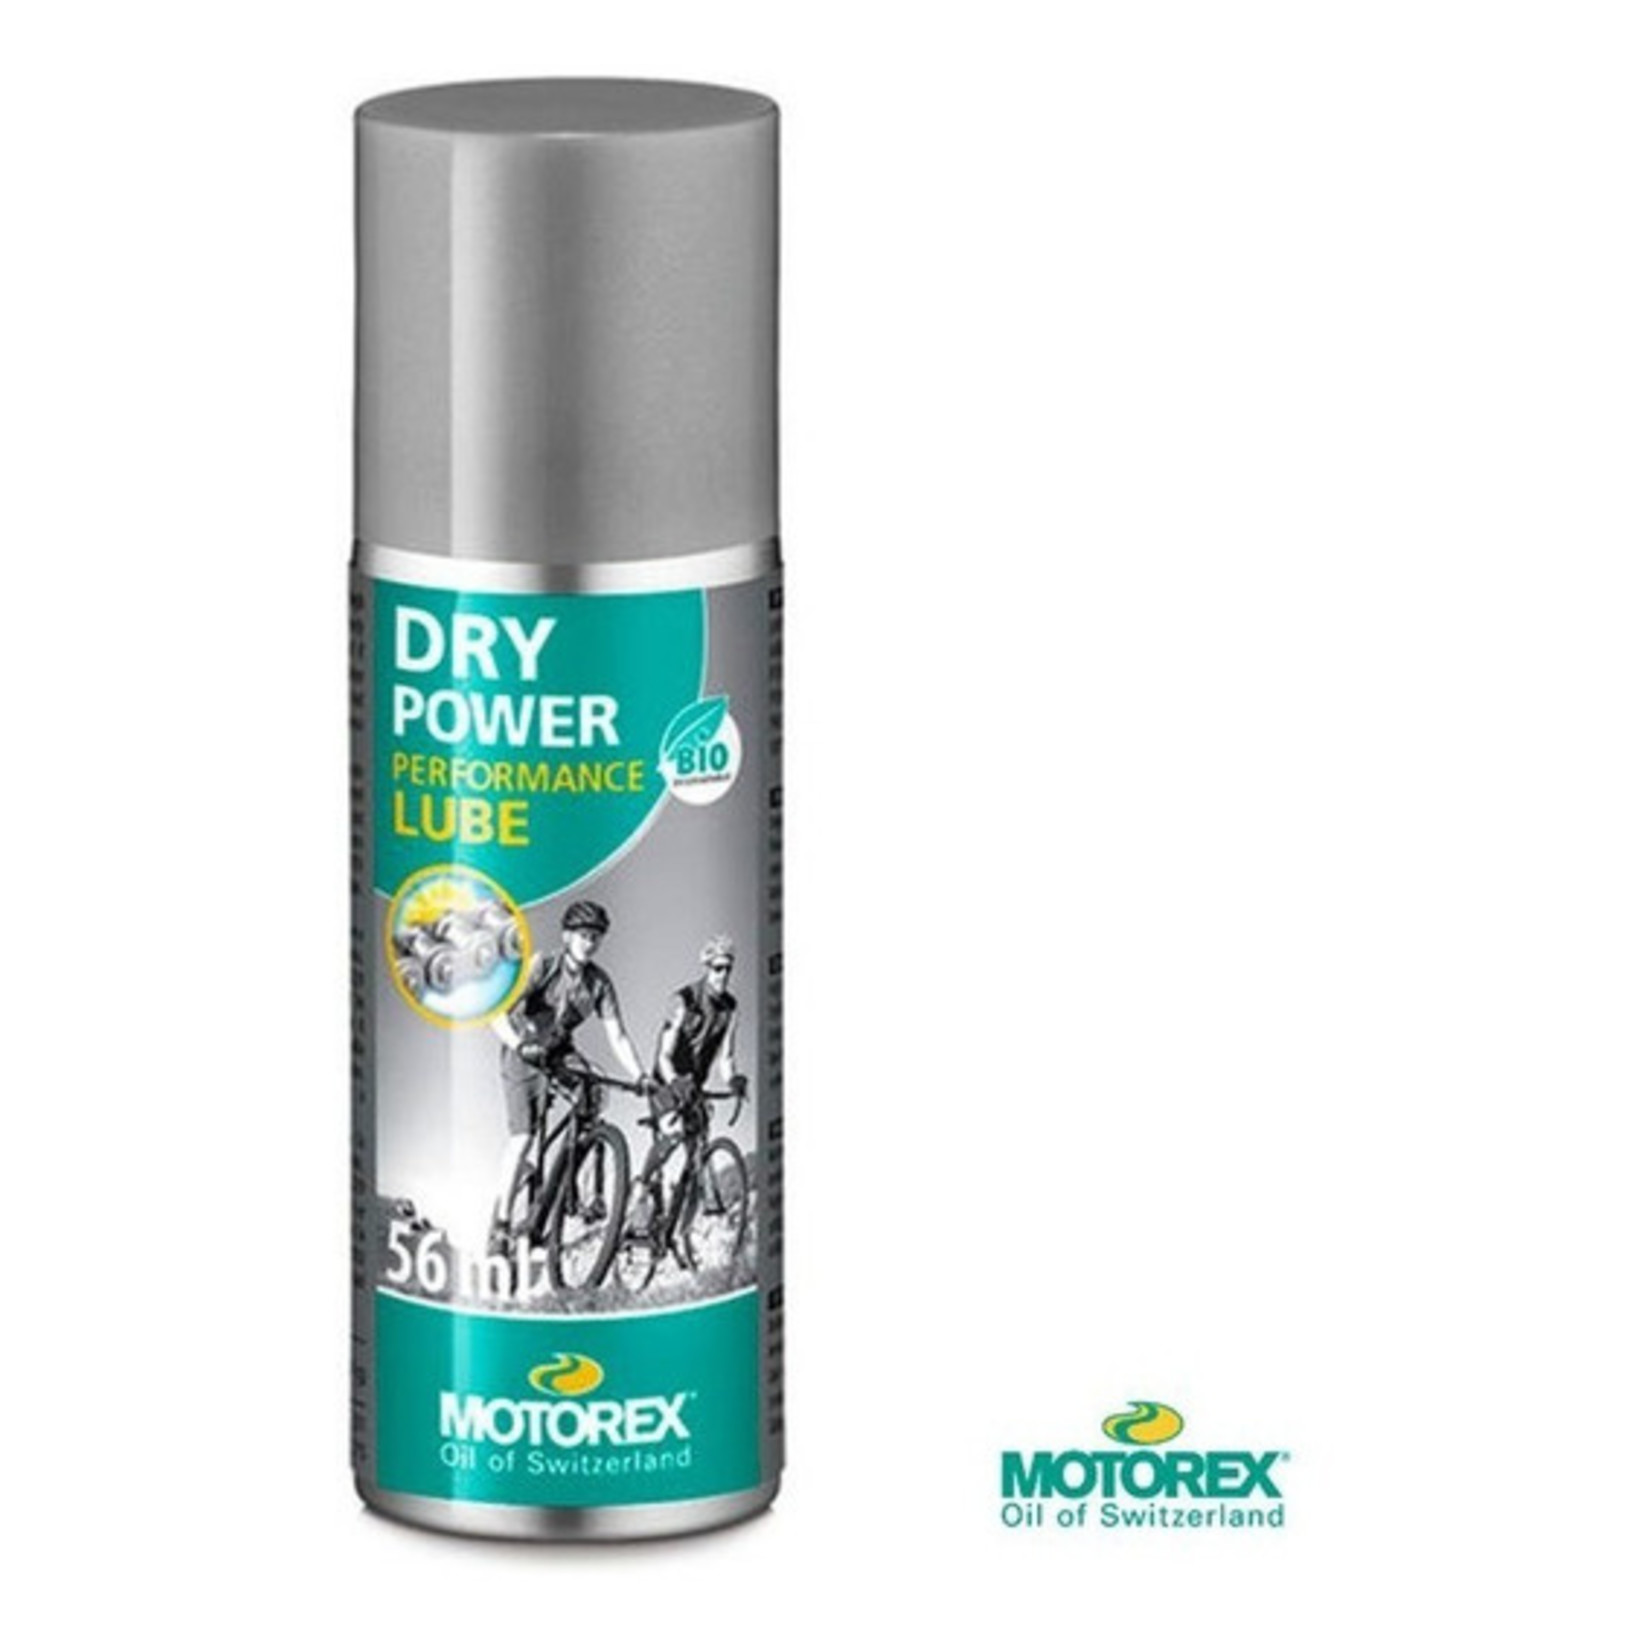 Motorex Dry Power Mini Spray 56ml